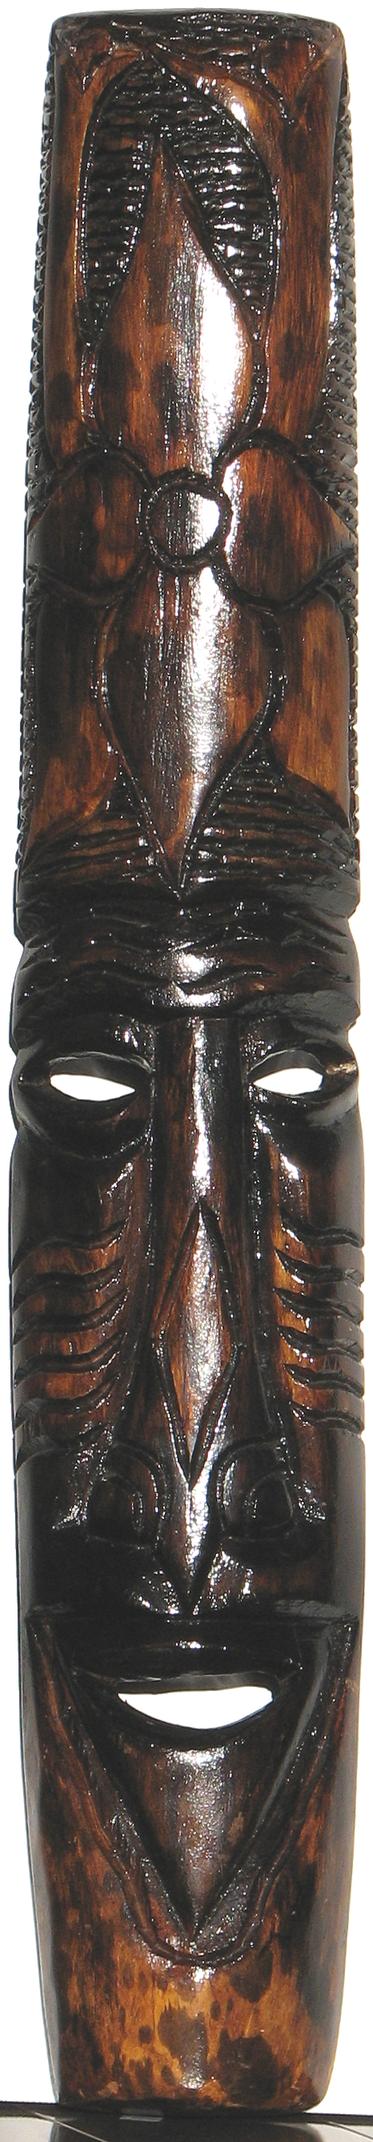 Hawaiian Wooden Mask Carving by buddhascii